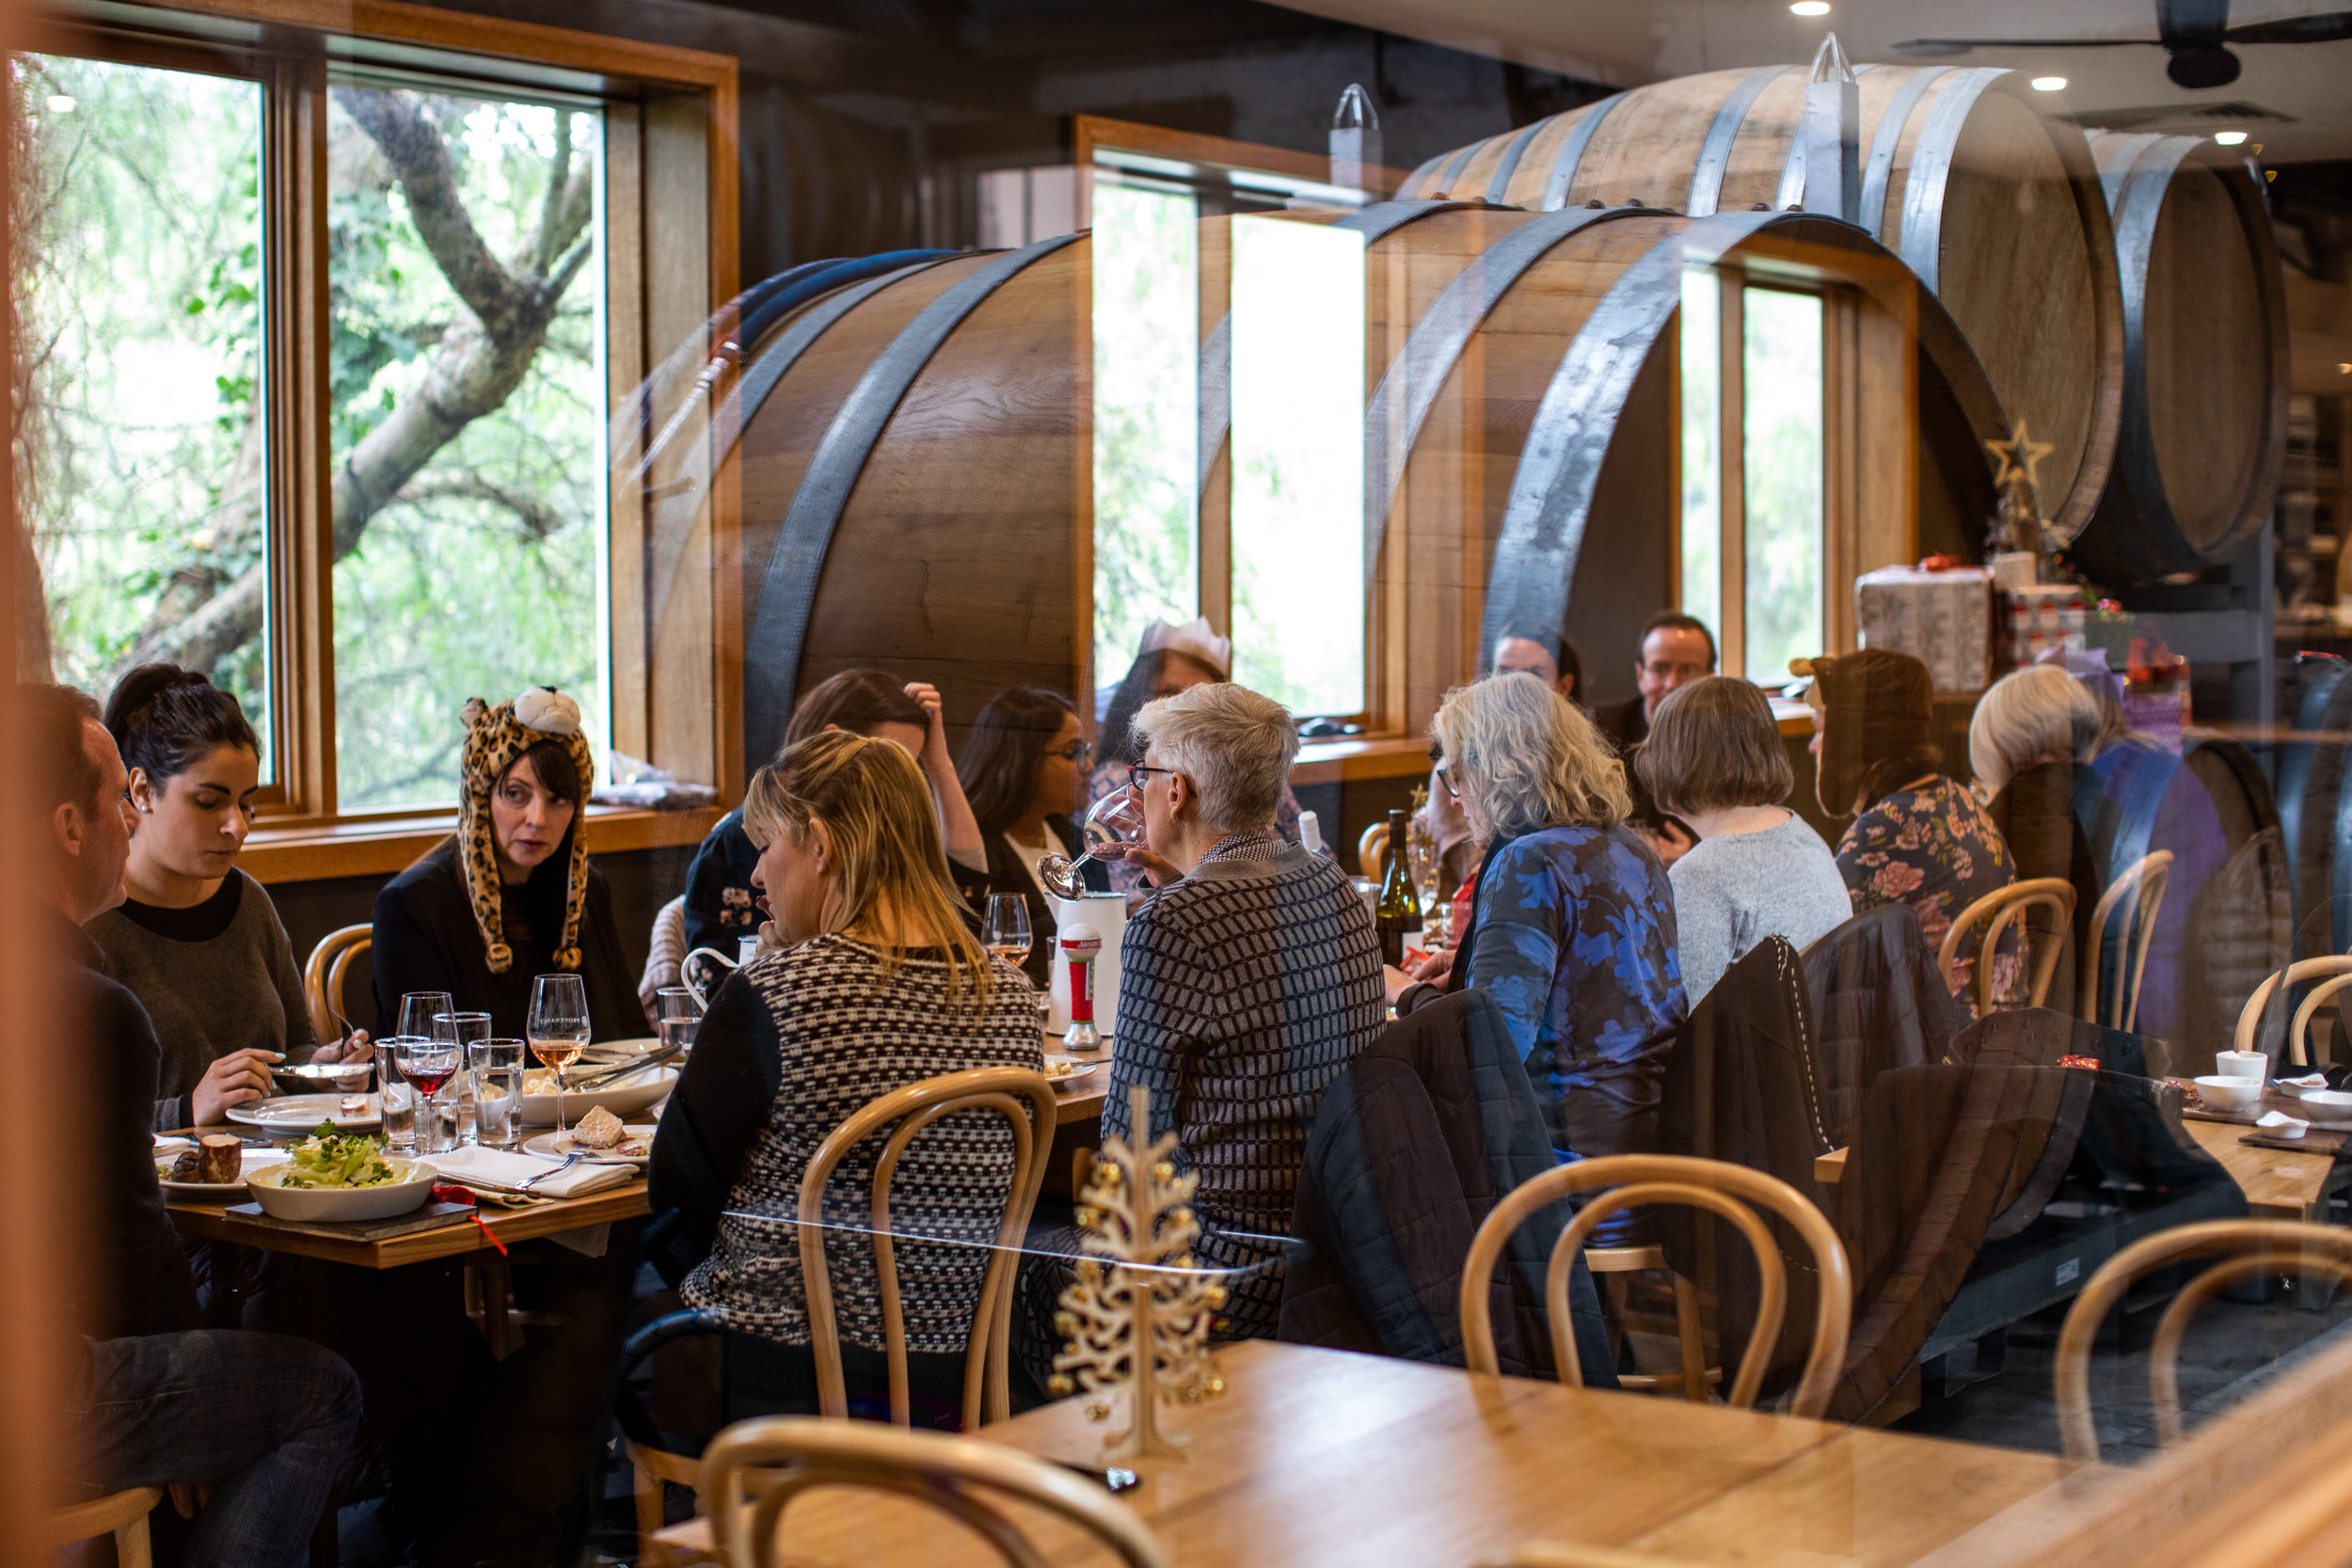 provenance-wines-geelong-restaurant-events-weddings-the-river-room.jpg